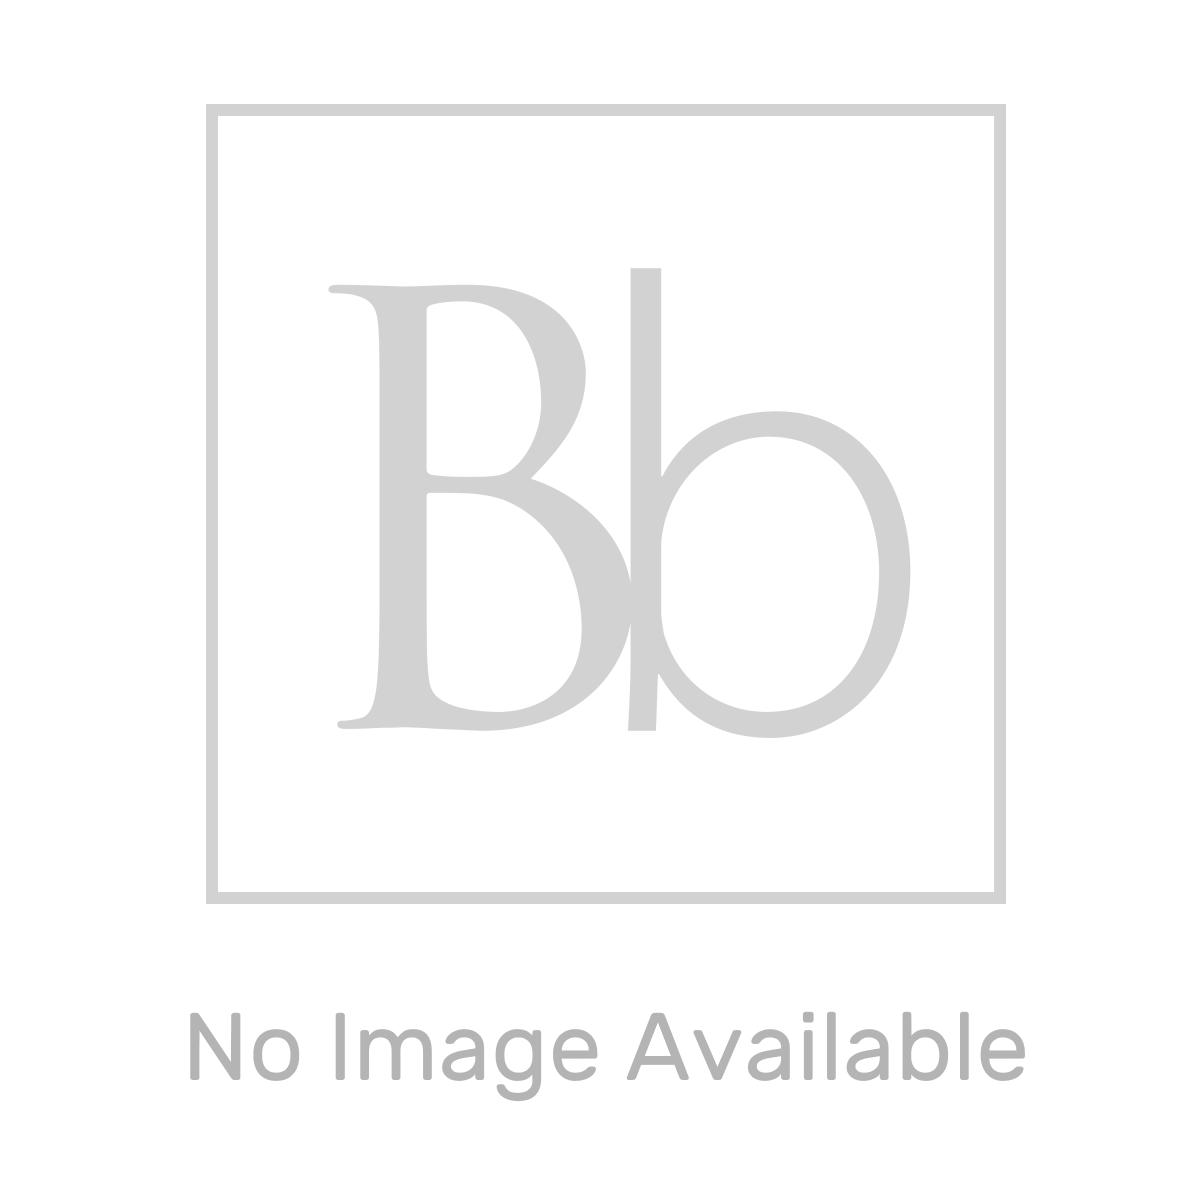 Tavistock Kobe White Bathroom Furniture Lifestyle